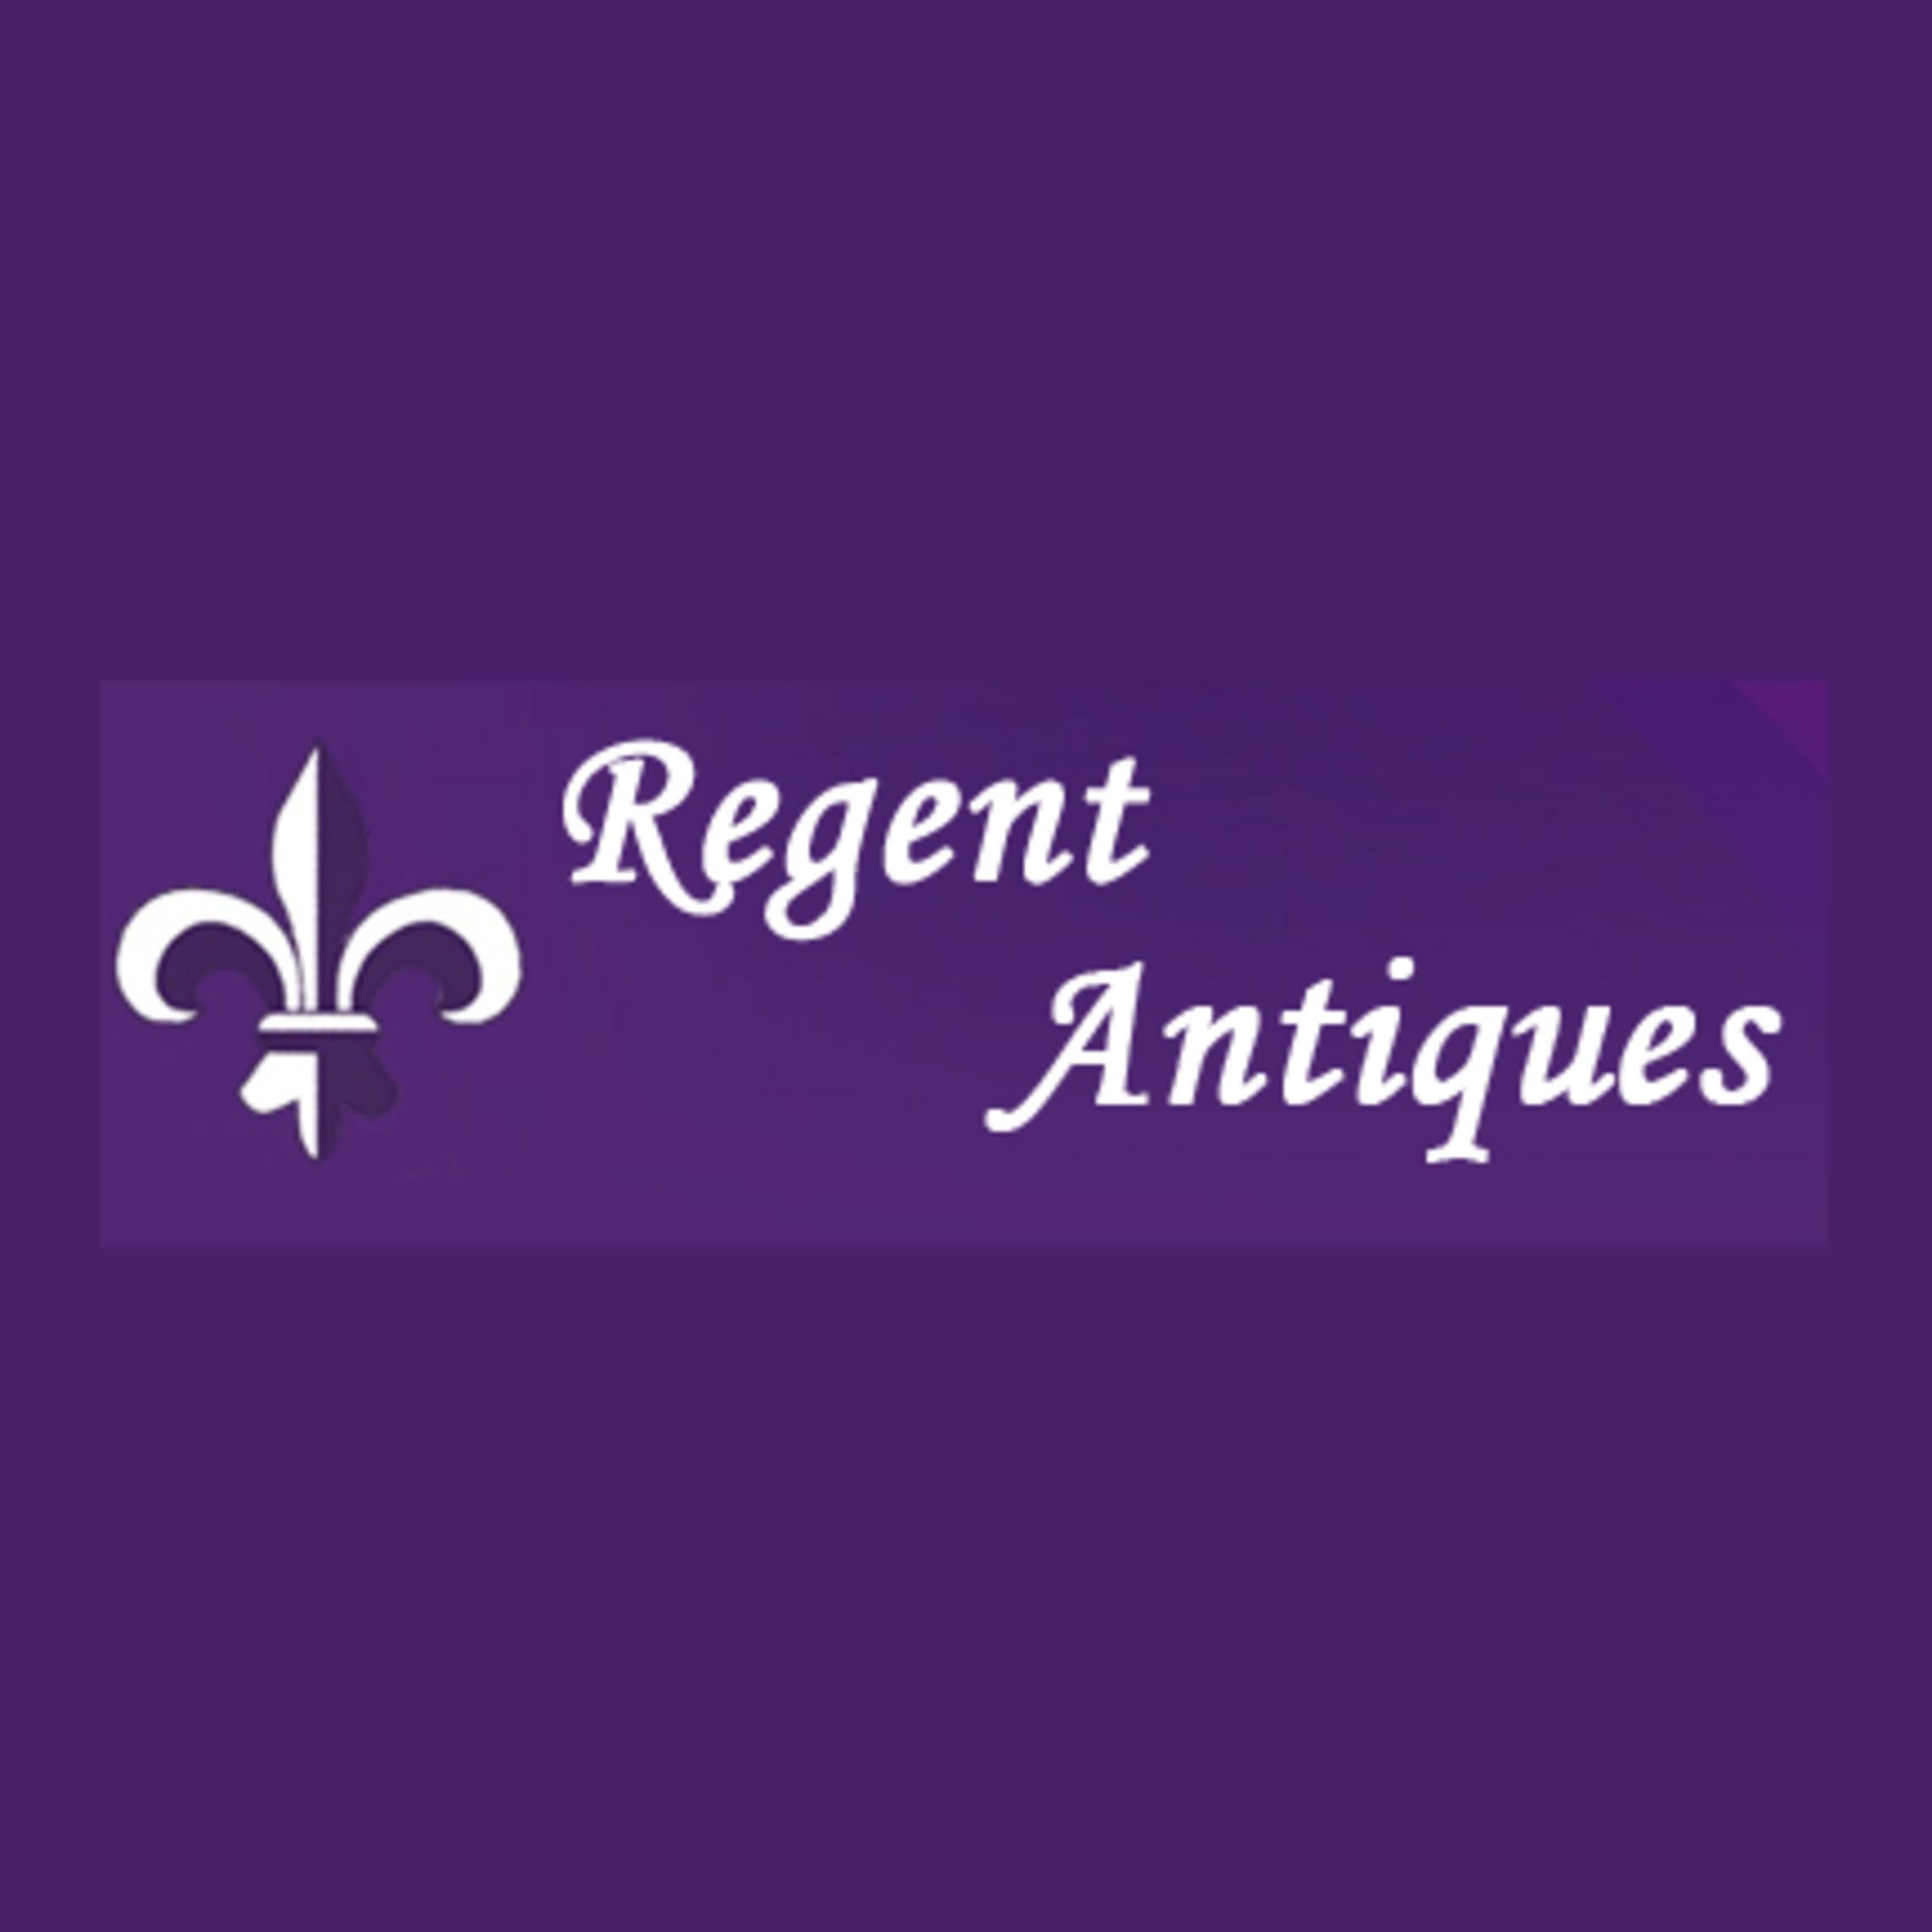 regent antiques- company logo